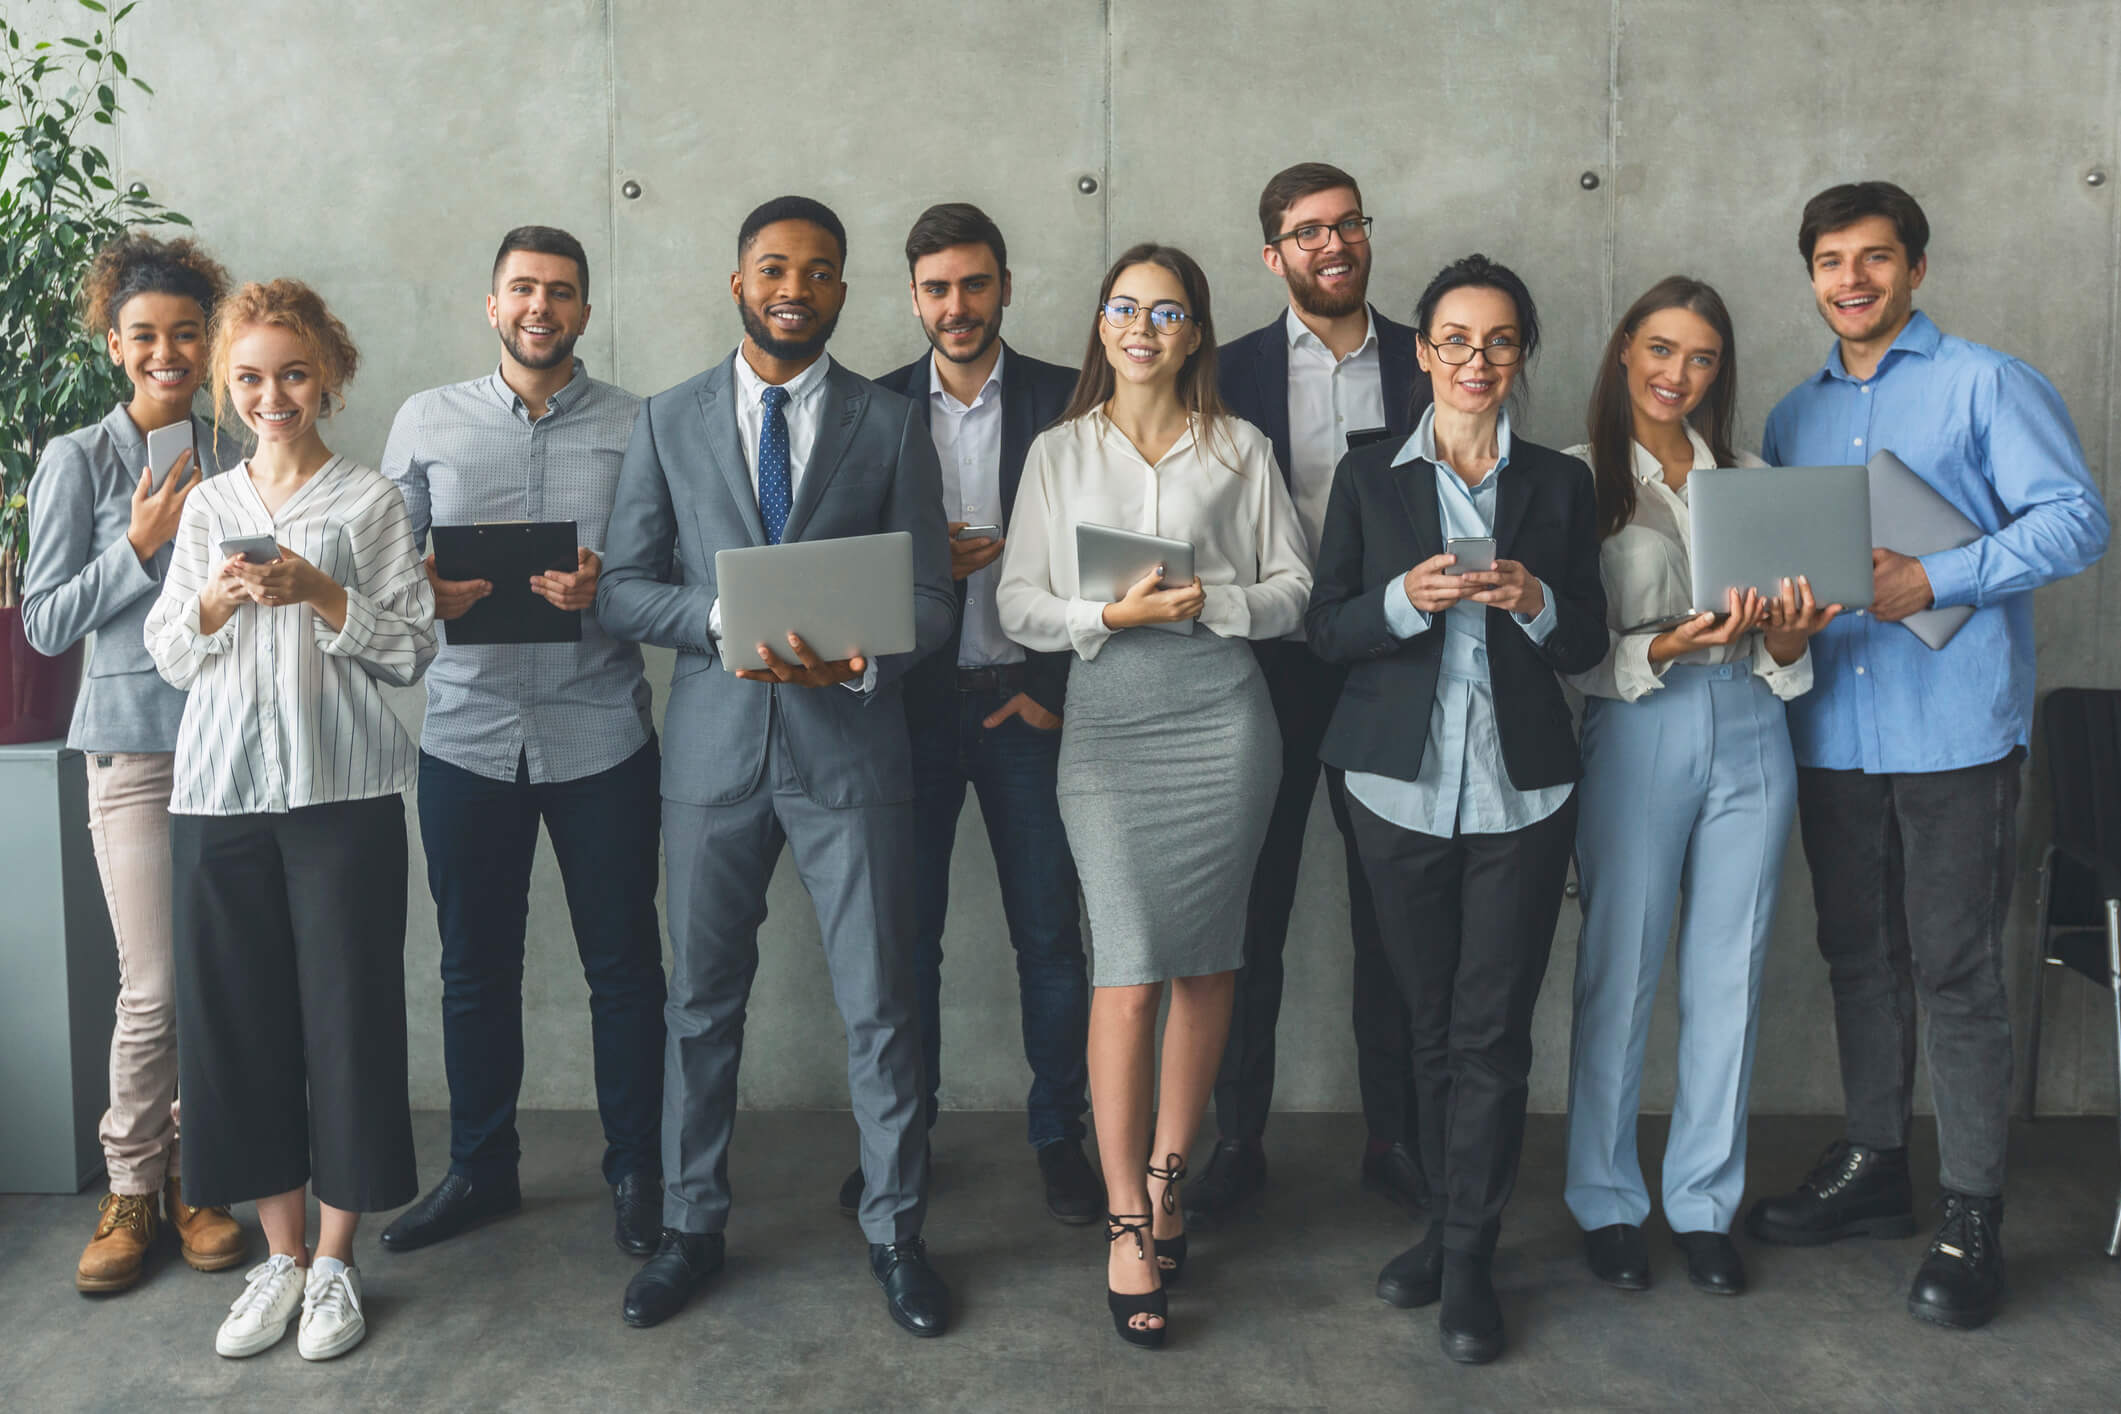 American employees